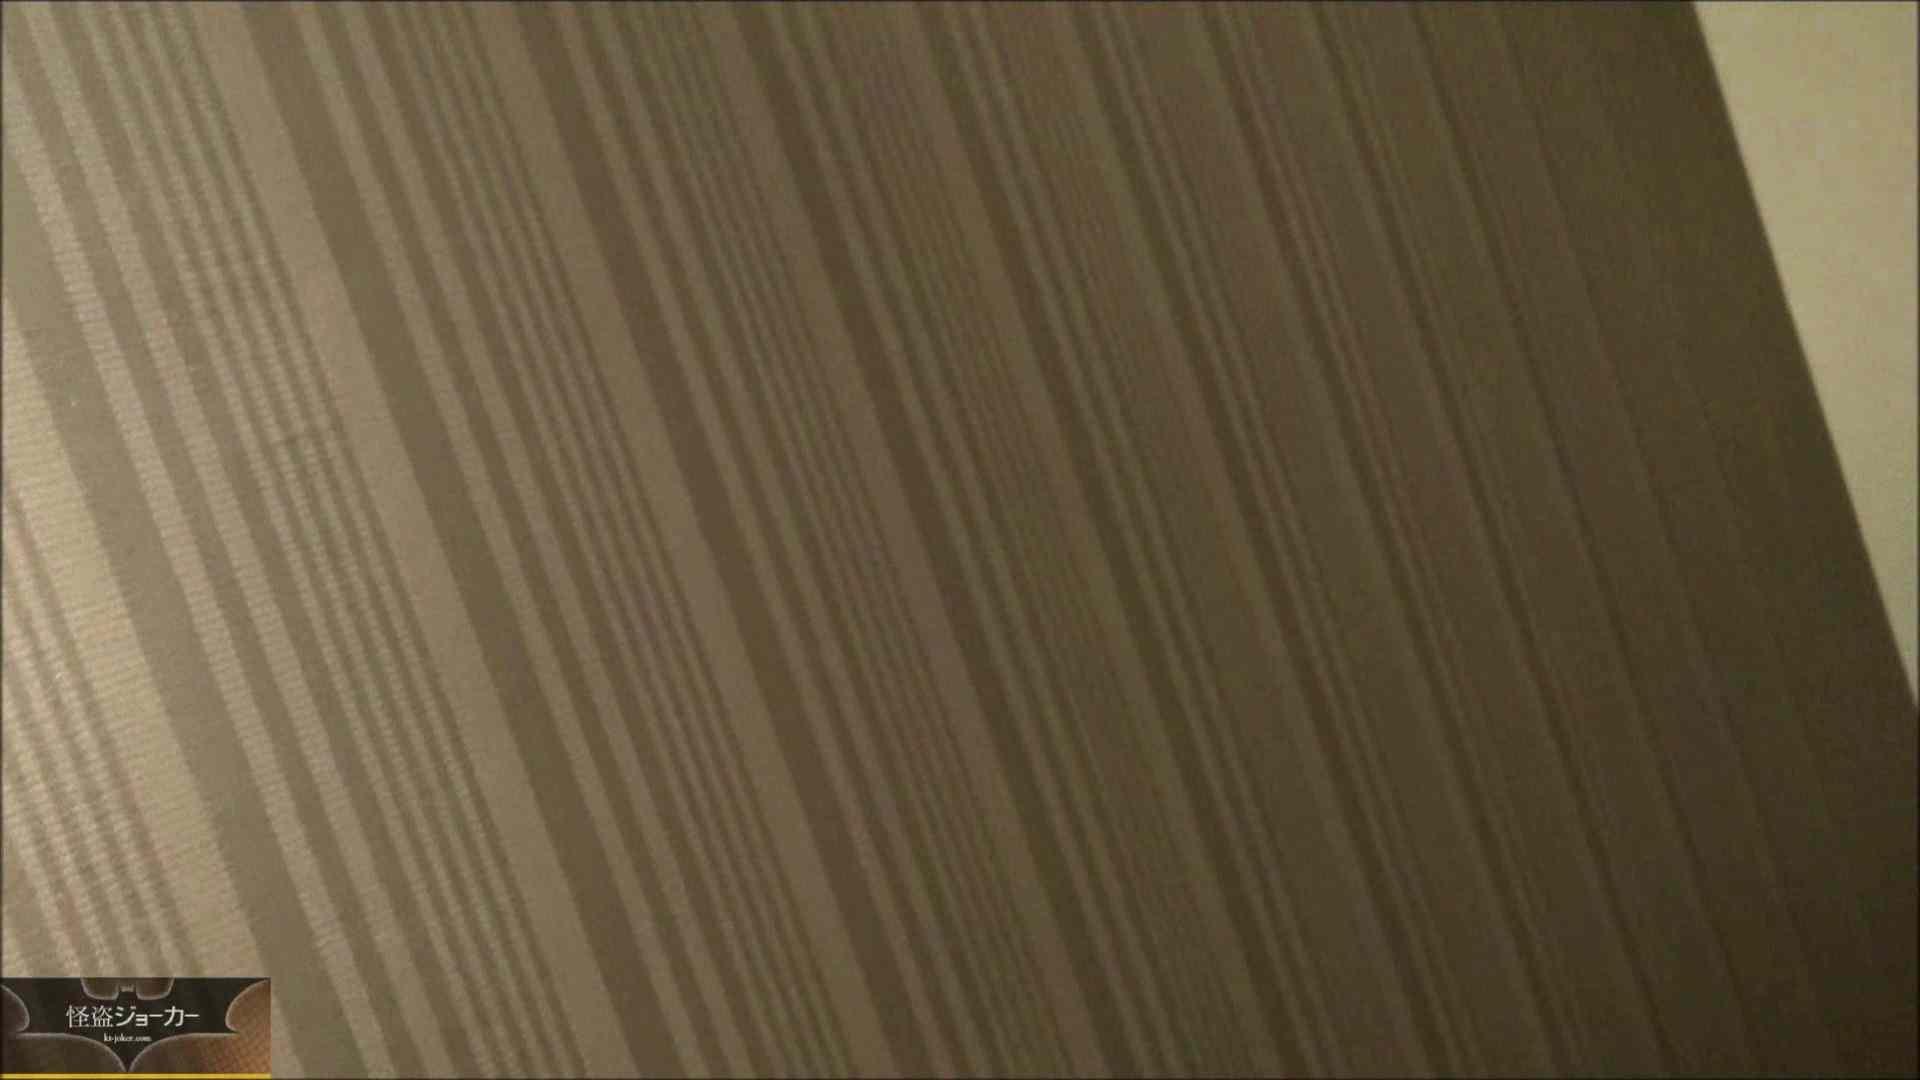 vol.76 {天然系☆若い娘}yuiちゃん_コスプレ撮影と騙してホテルで… マンコ AV無料動画キャプチャ 96連発 57